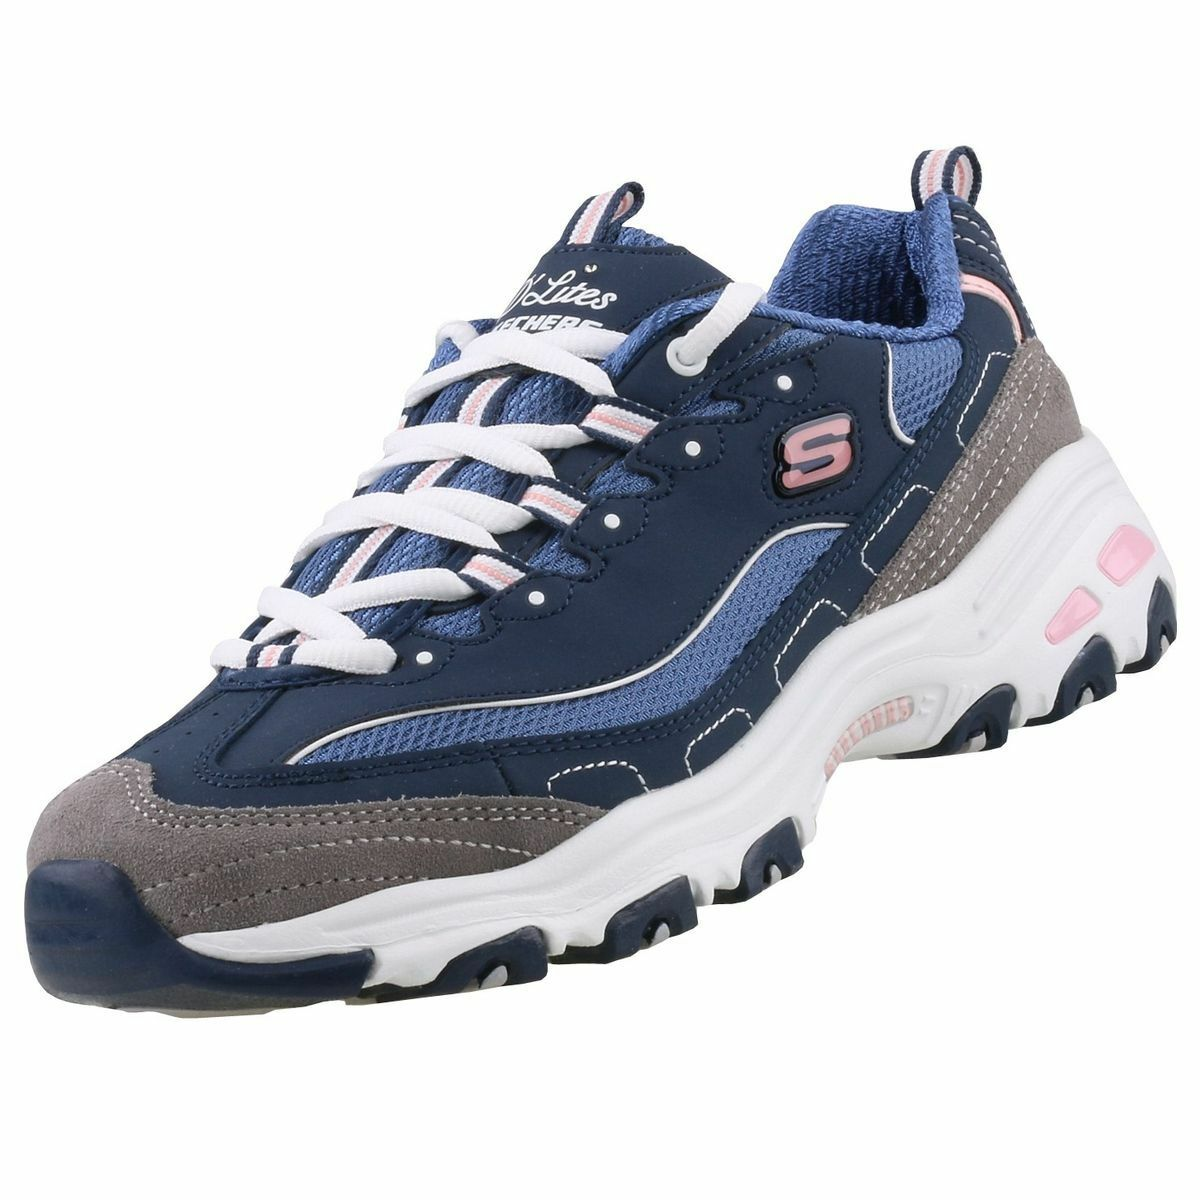 Skechers Nuevo Zapatos Zapatillas Mujer D´ Cordones Lites dwxpzw4H